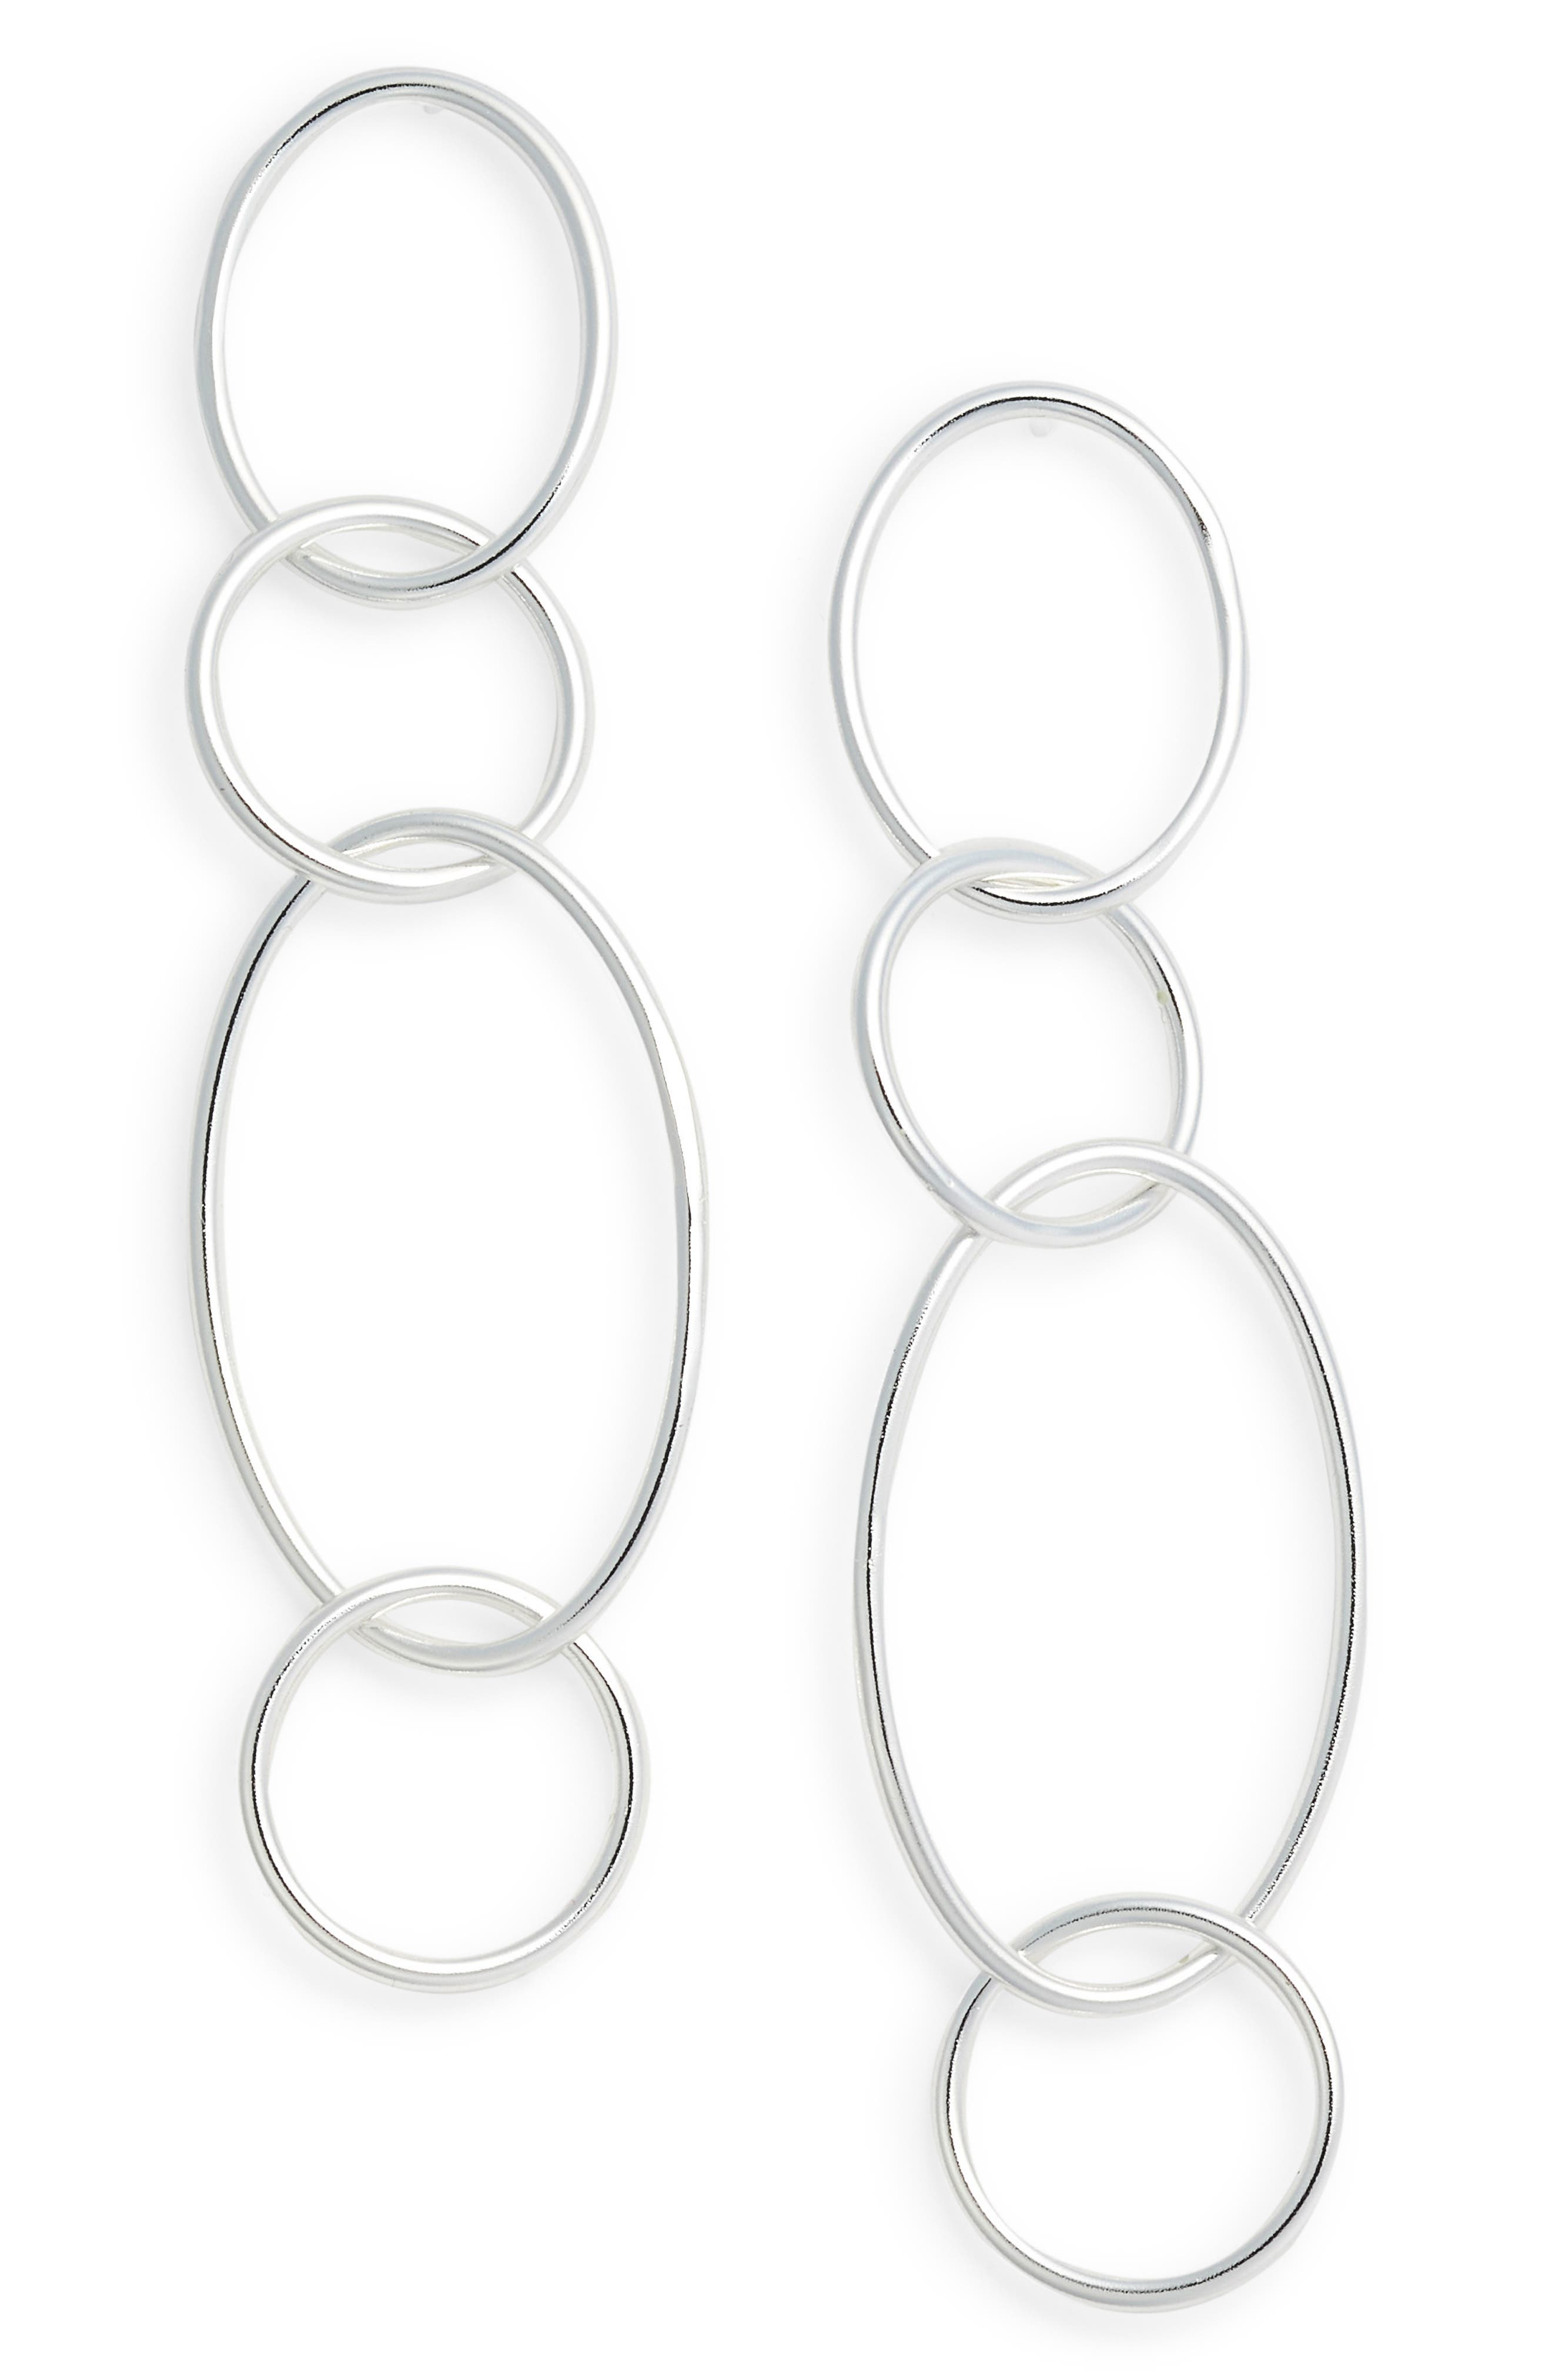 Drop Link Earrings,                         Main,                         color, SILVER